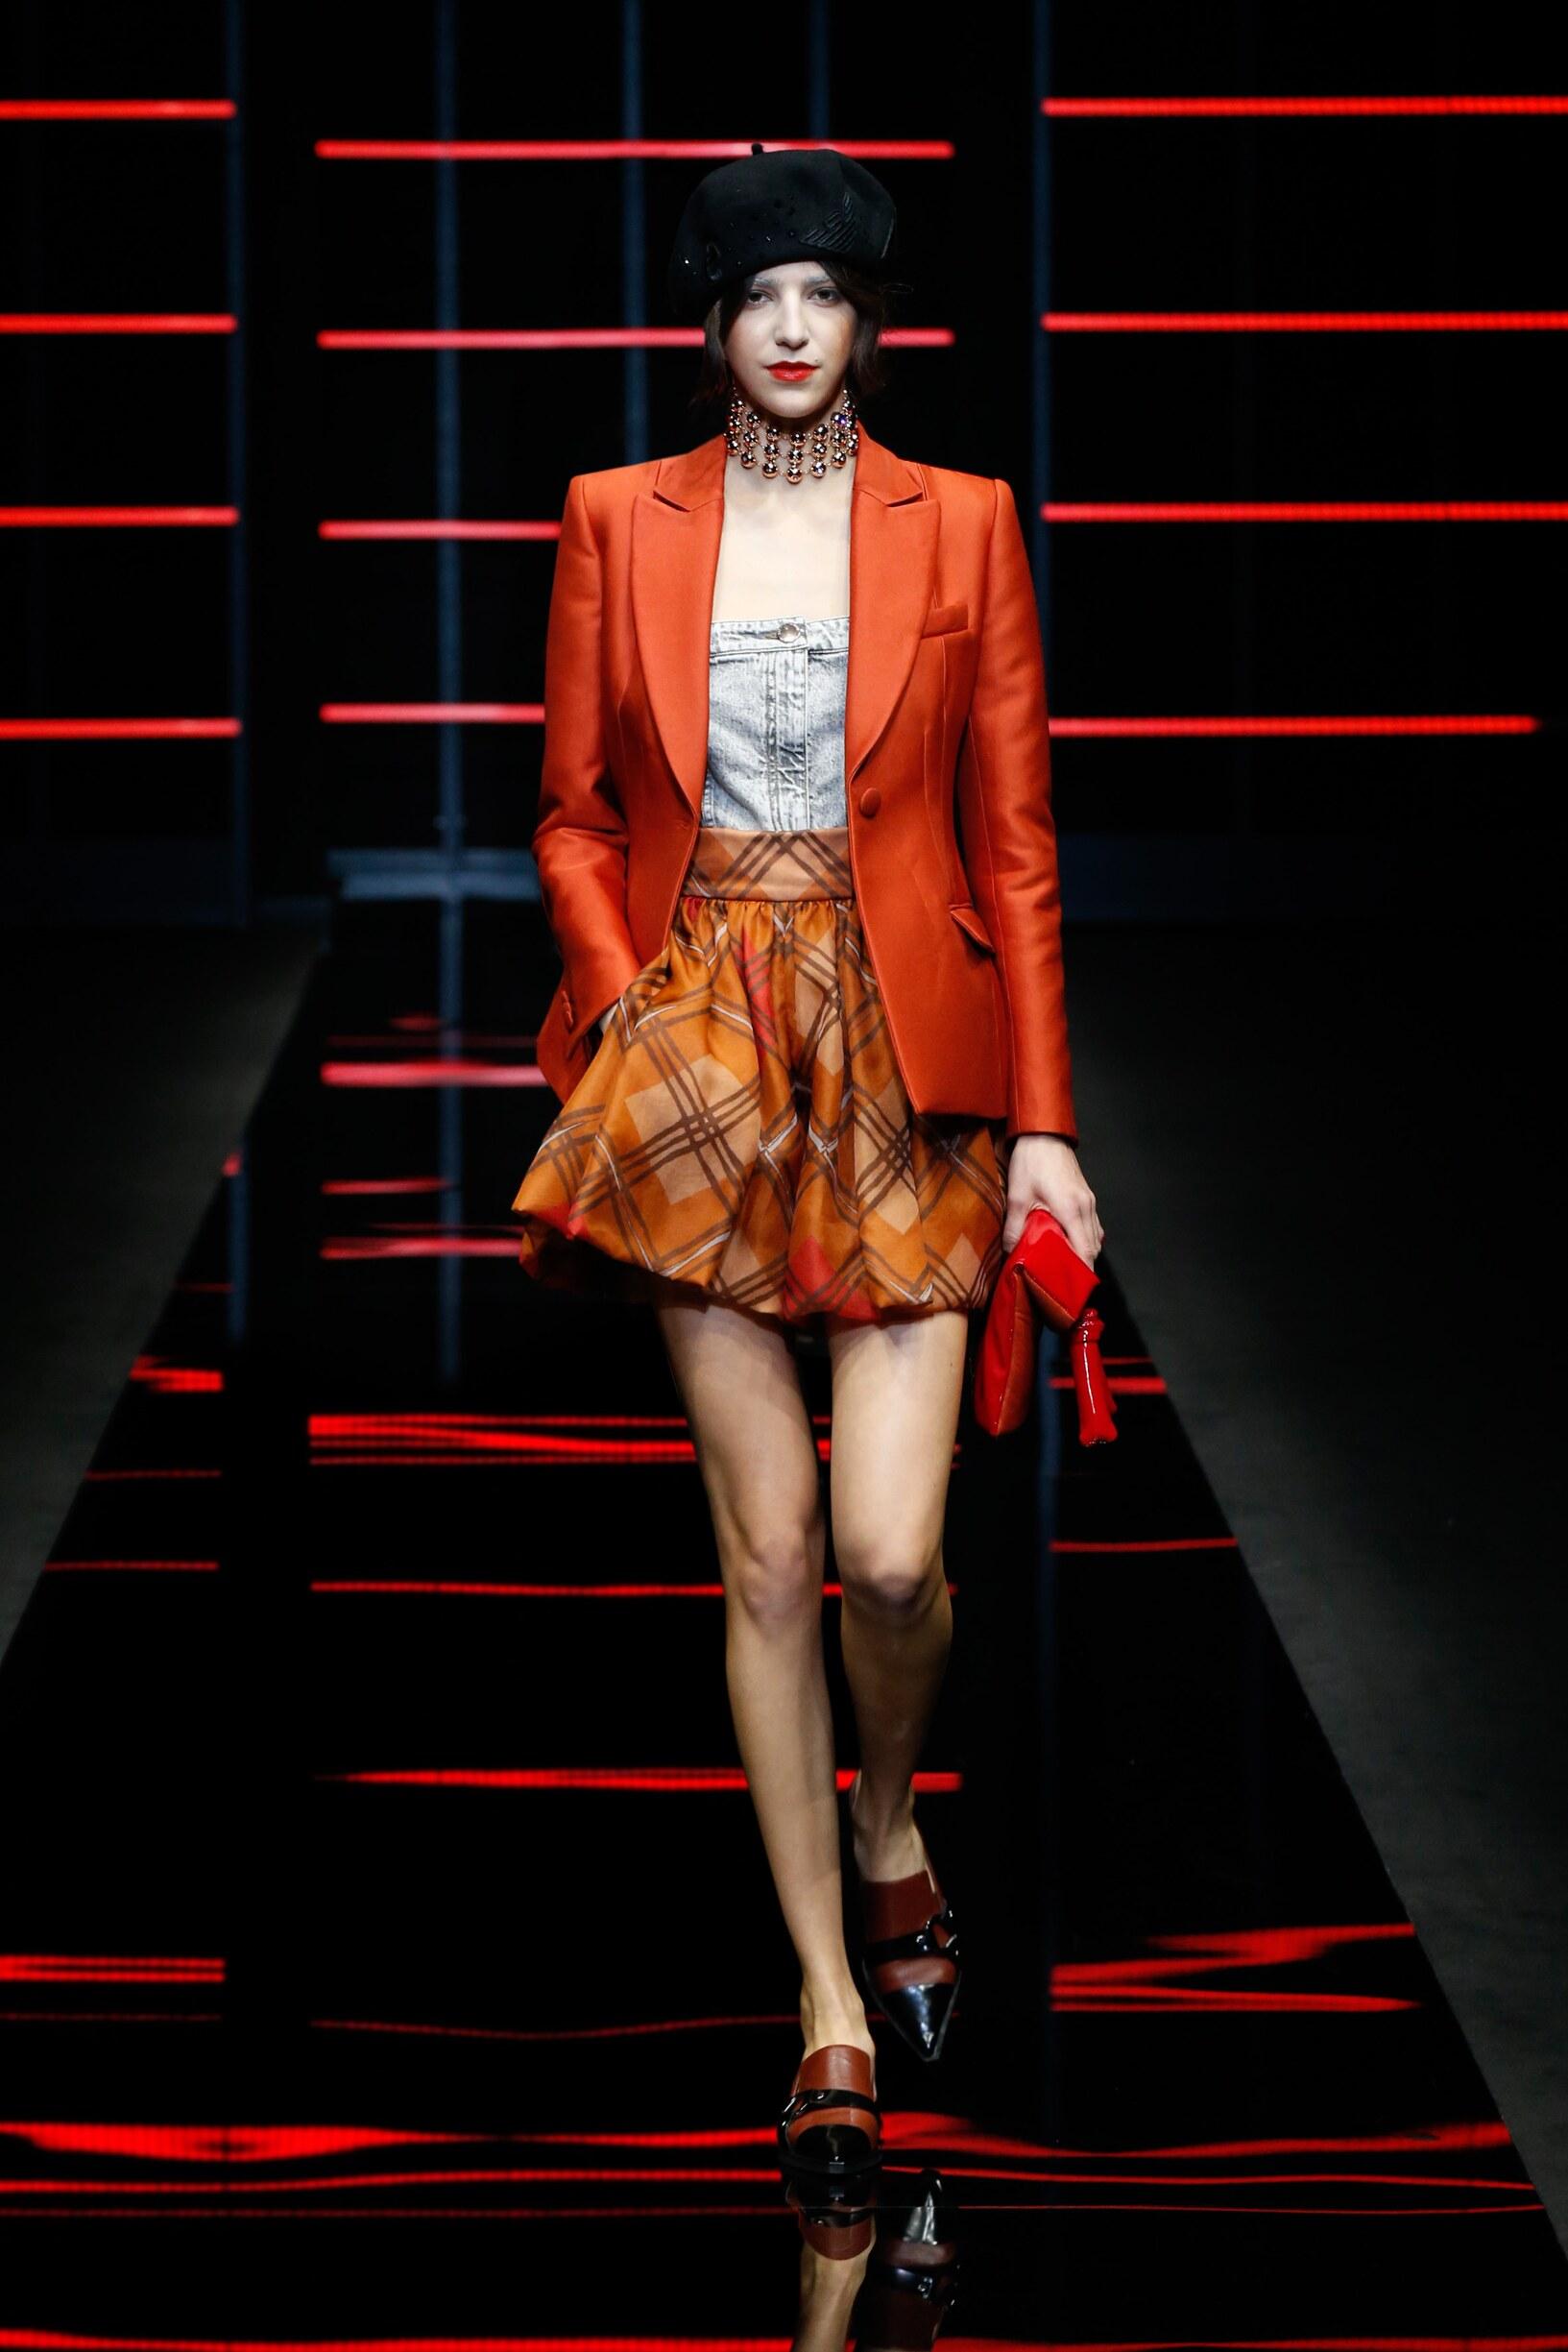 FW 2019-20 Fashion Show Emporio Armani